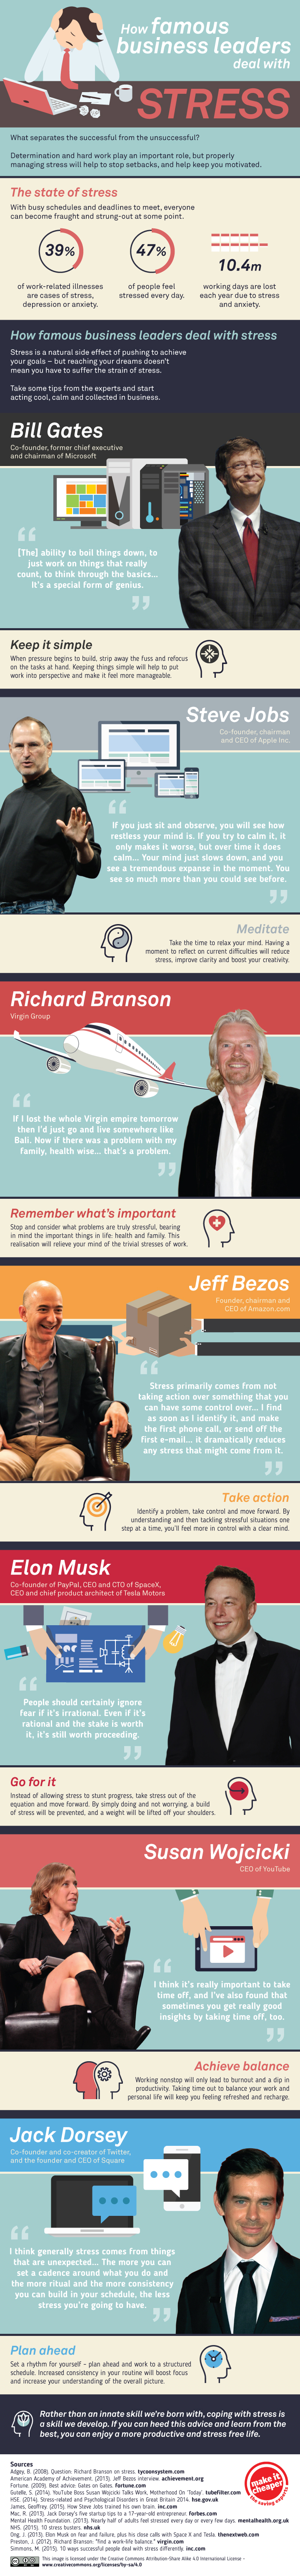 stress infographic